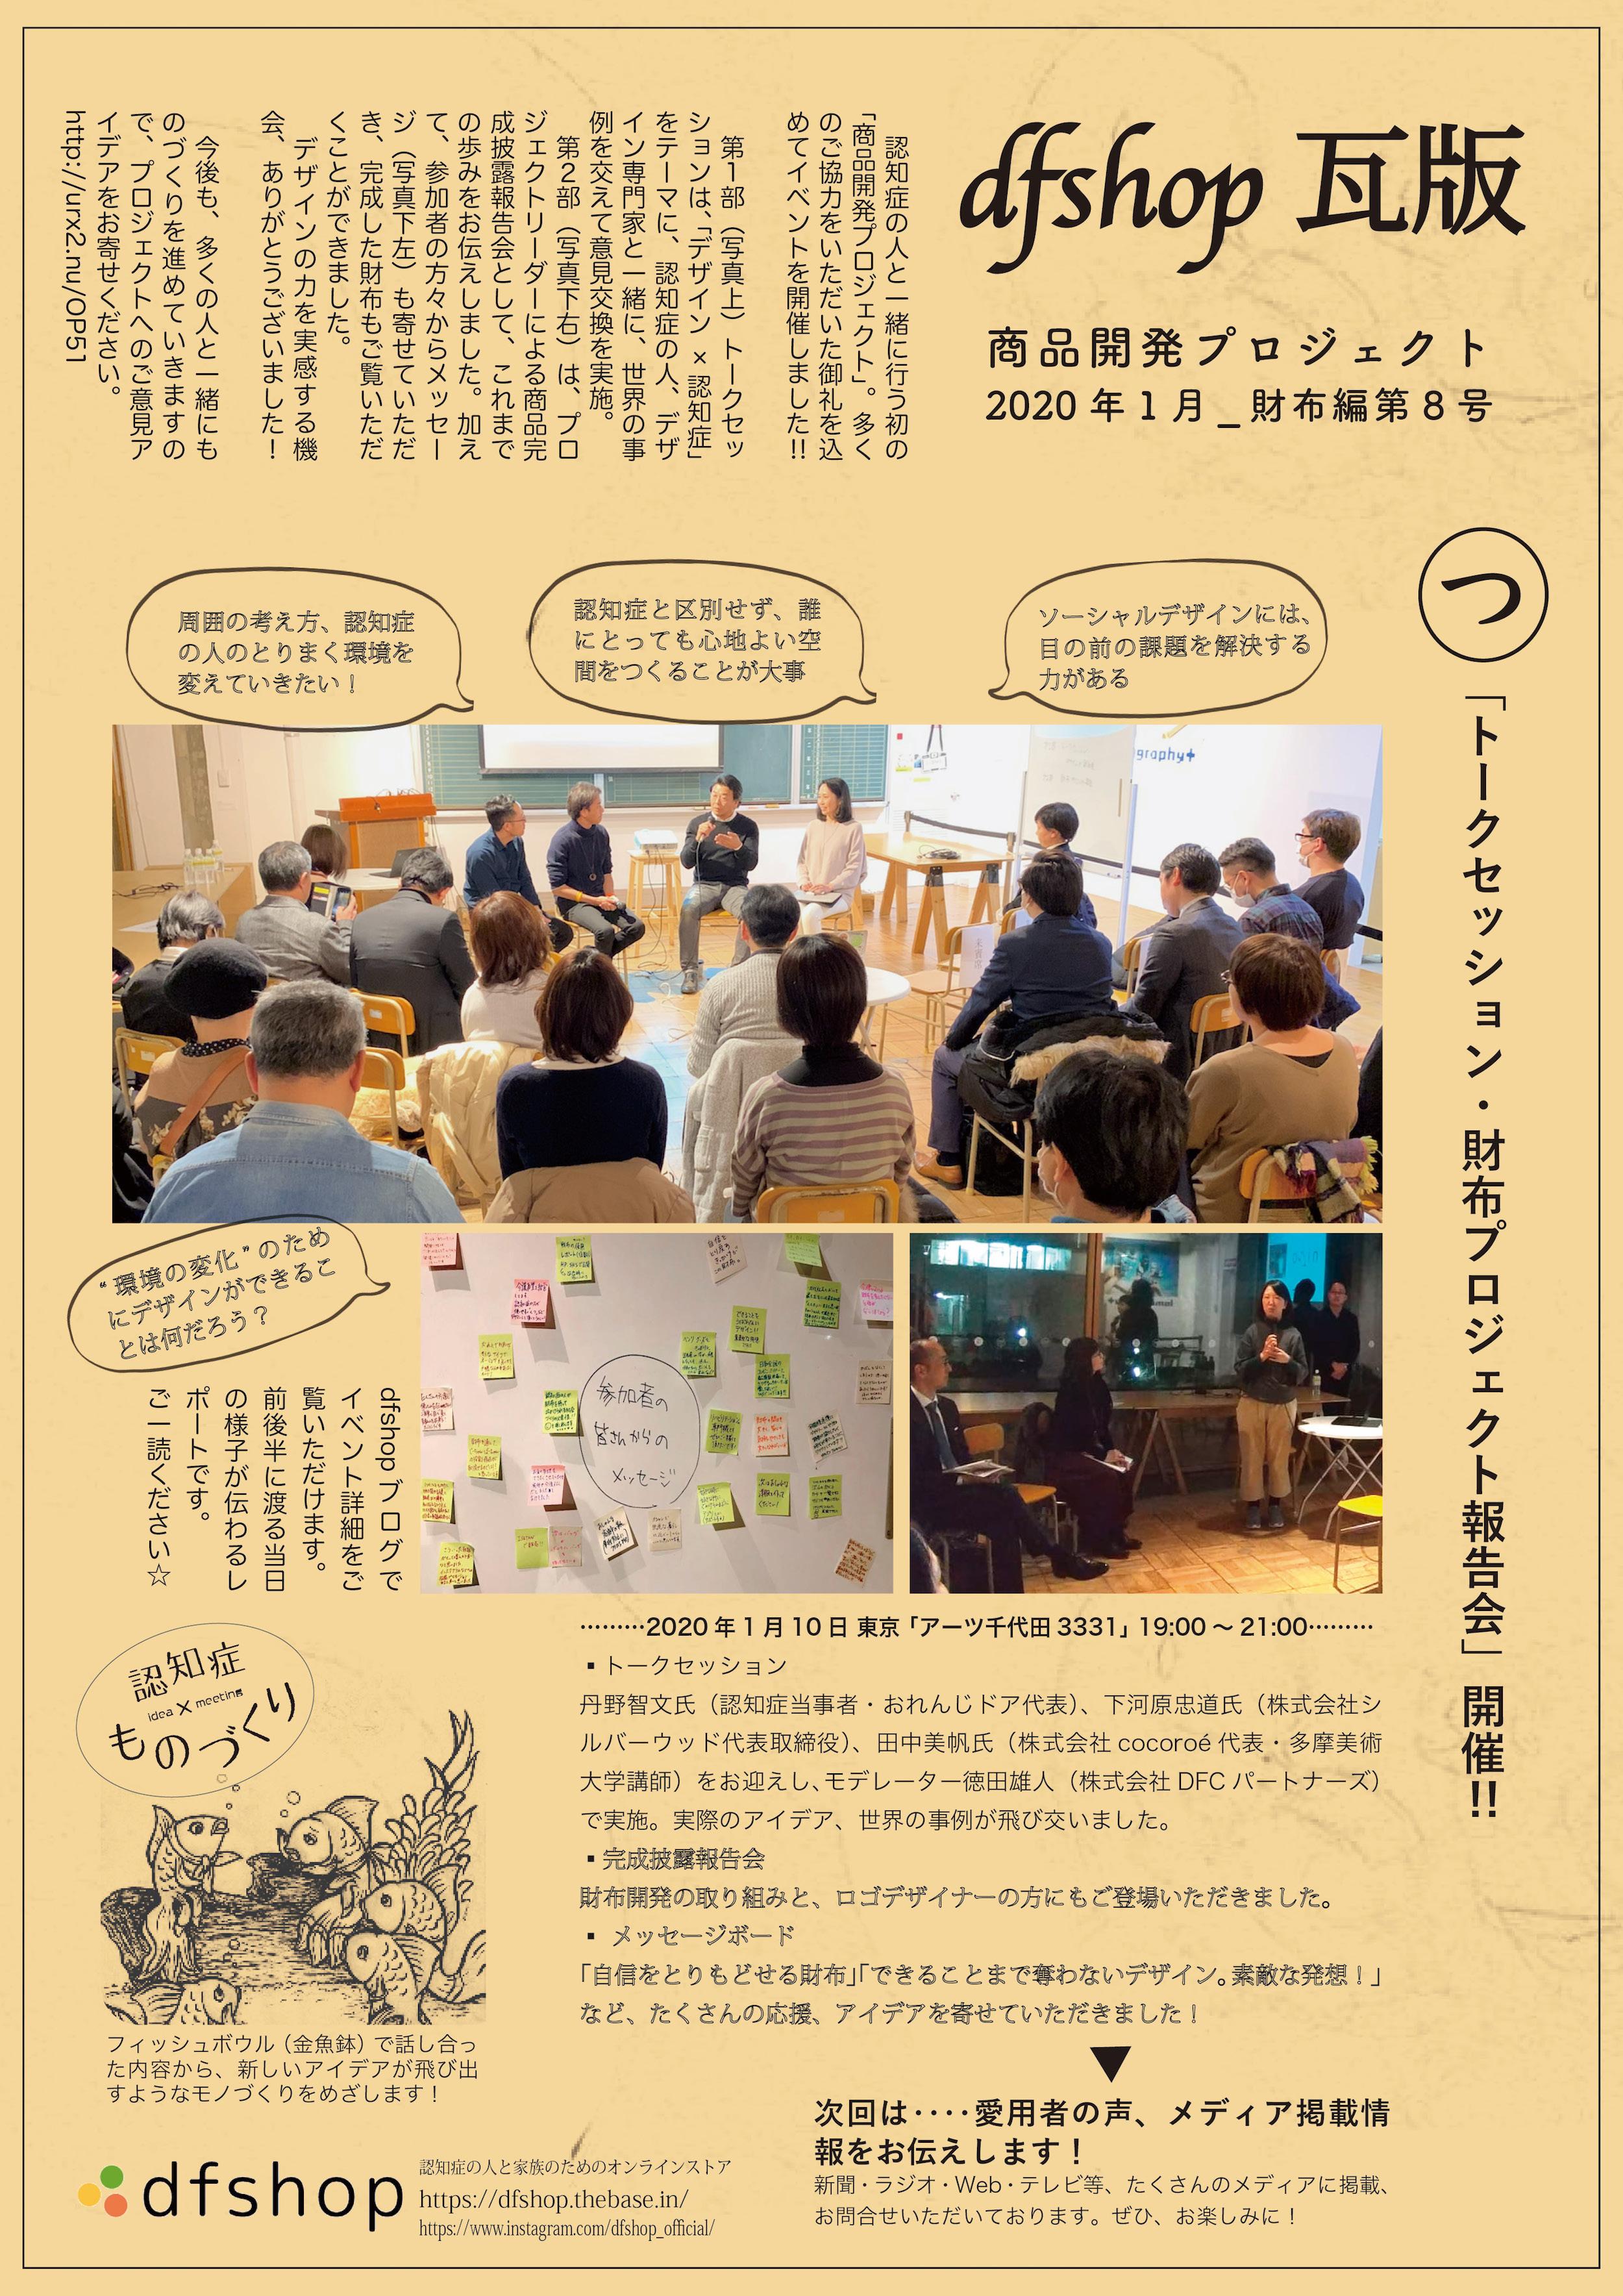 【dfshop 瓦版 08号】 -「トークセッション・財布プロジェクト報告会」開催!! -